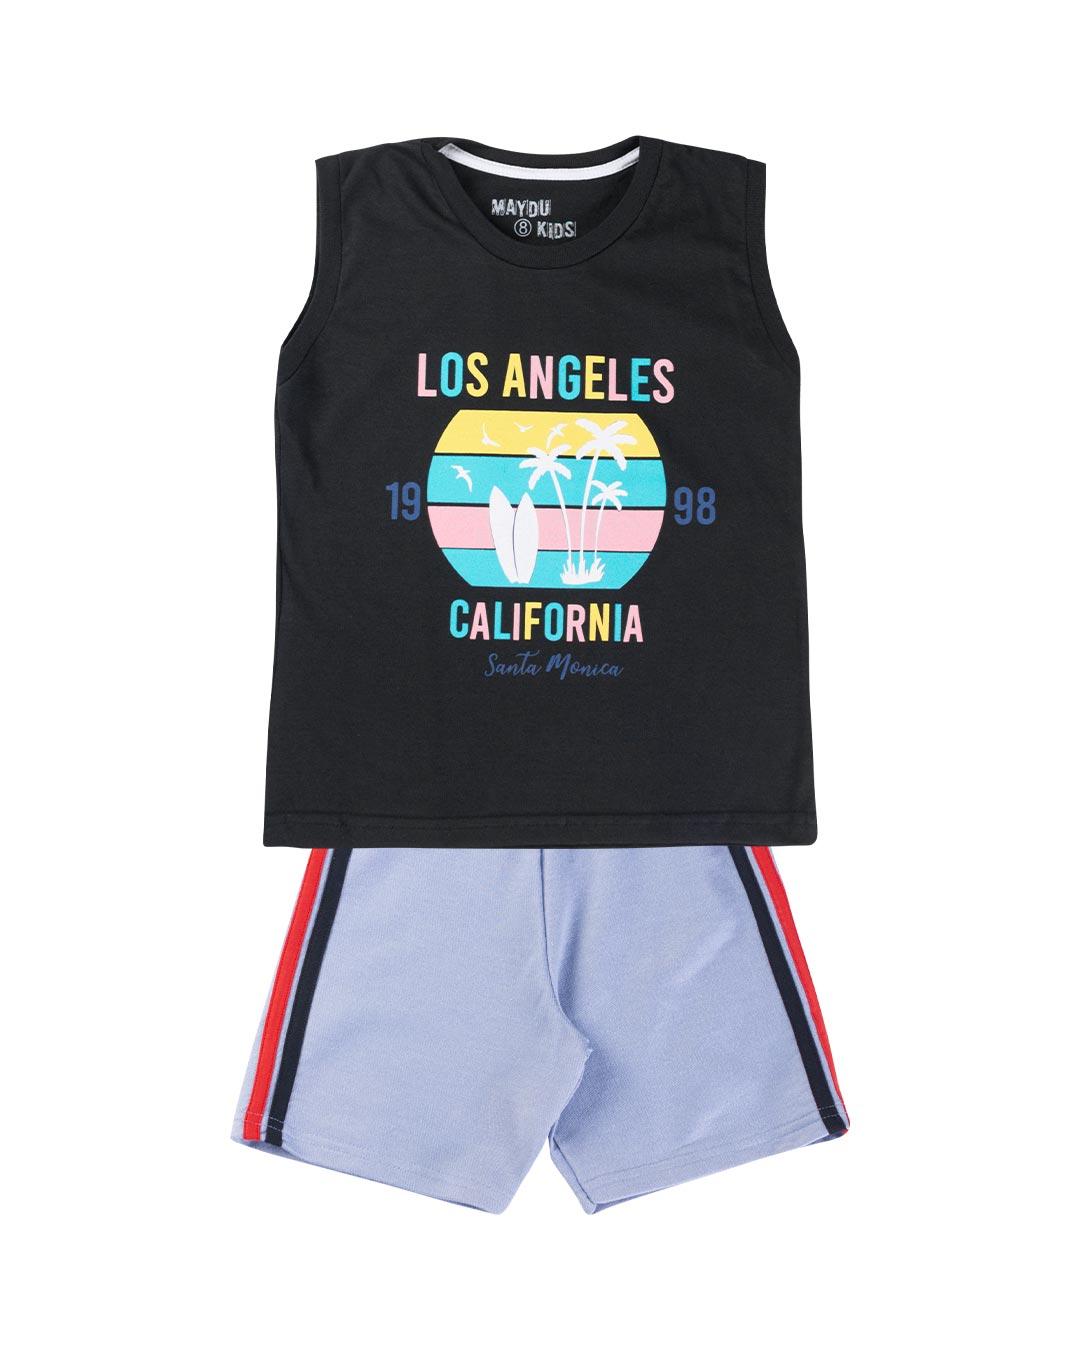 Conjunto Infantil Los Angeles Califórnia - Maydu Kids